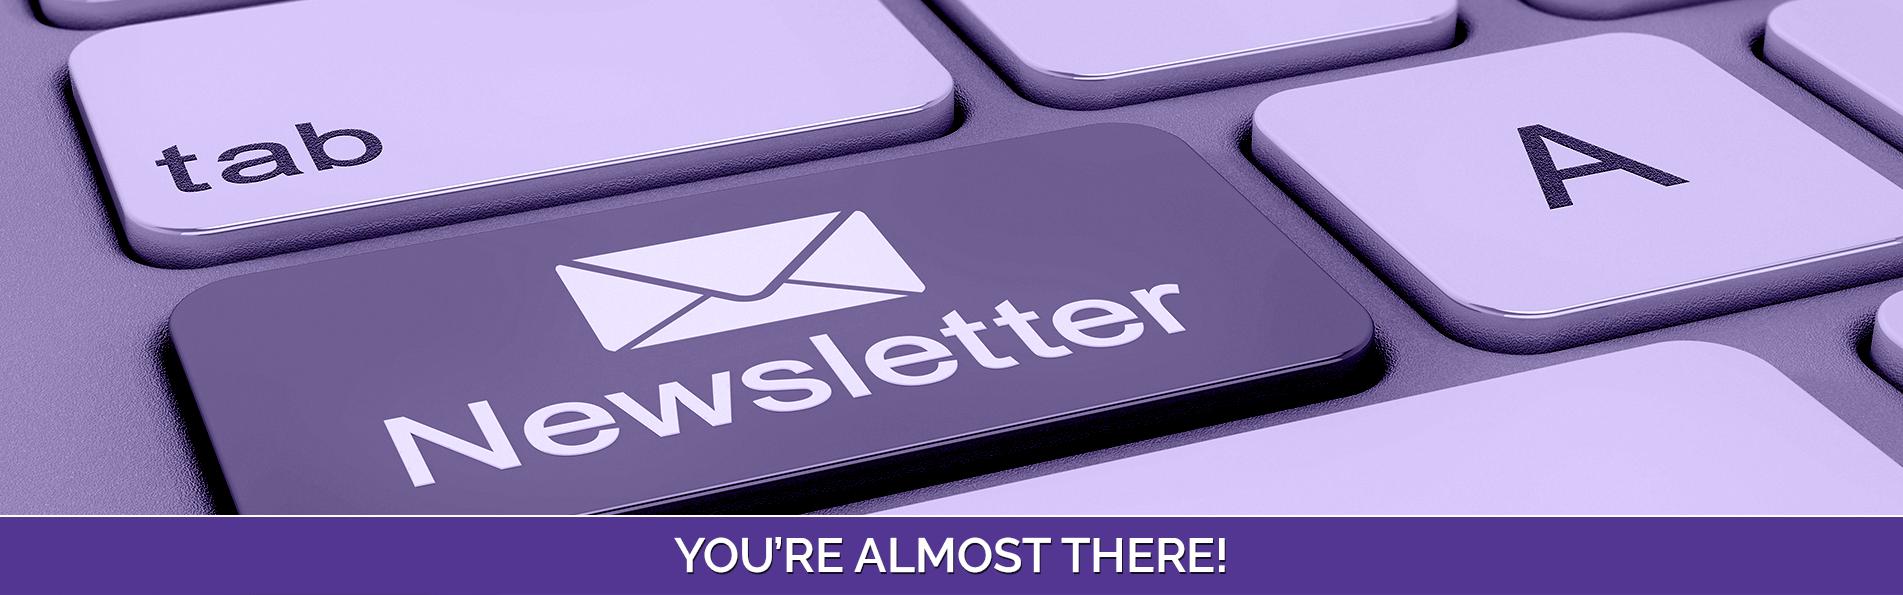 Newsletter sign up - Banner